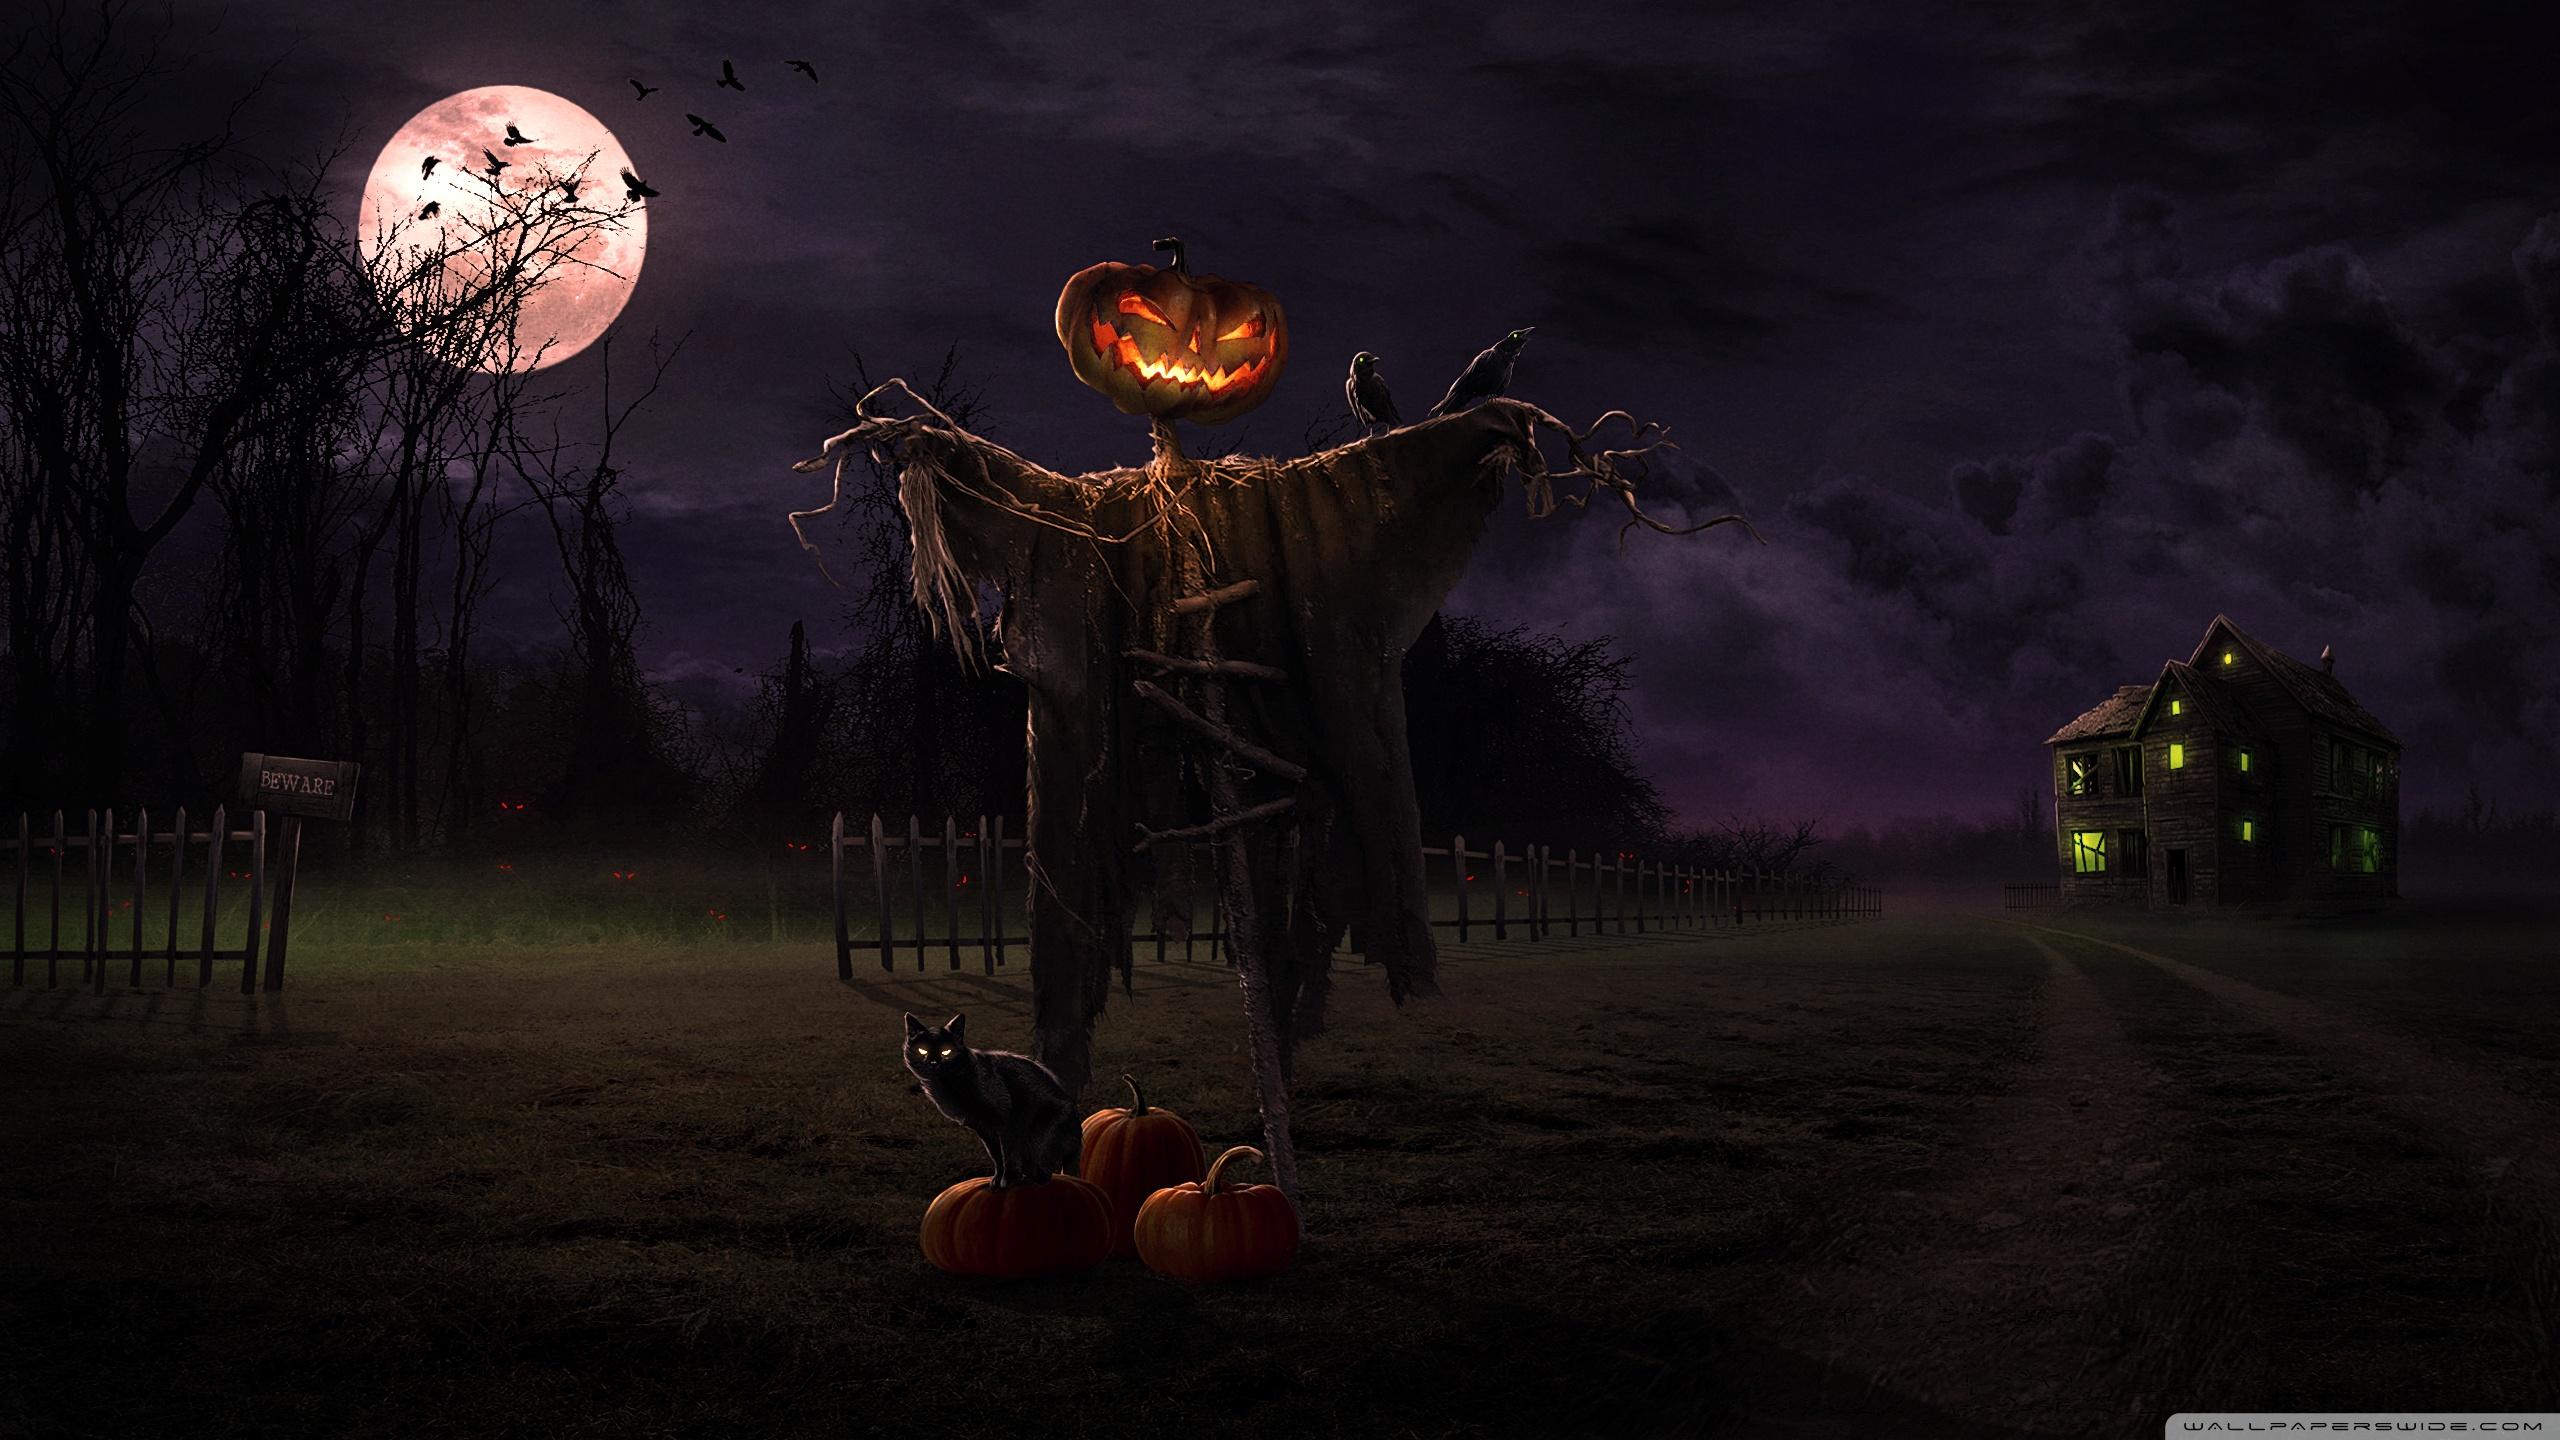 Beautiful Wallpaper Halloween Light - spooky_path-wallpaper-2560x1440  Image_218299.jpg?200